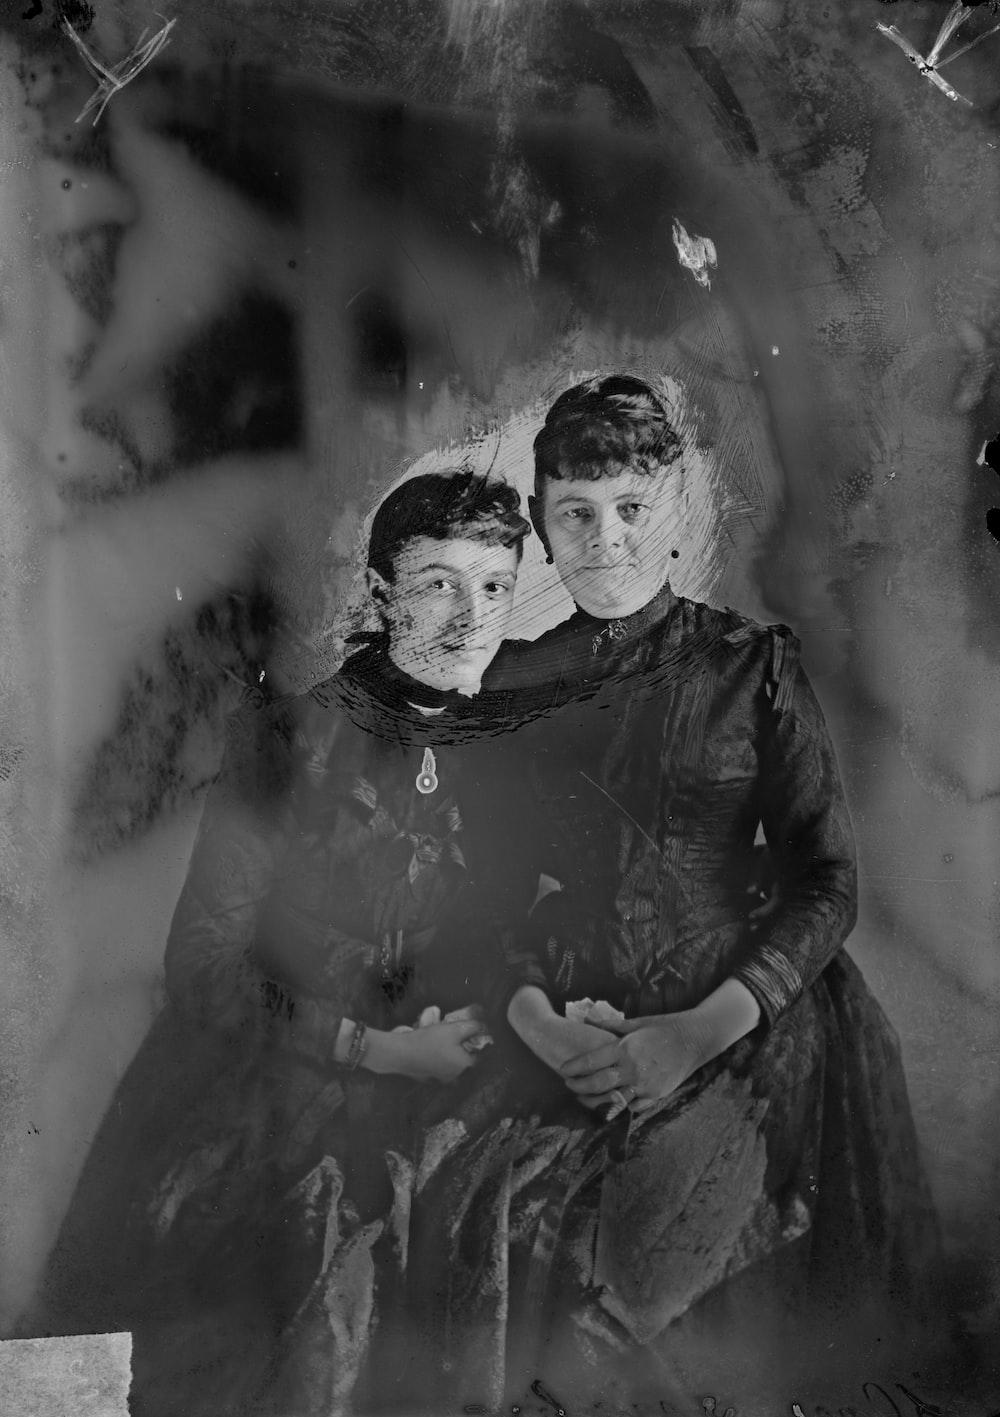 woman in black long sleeve dress carrying girl in black long sleeve dress